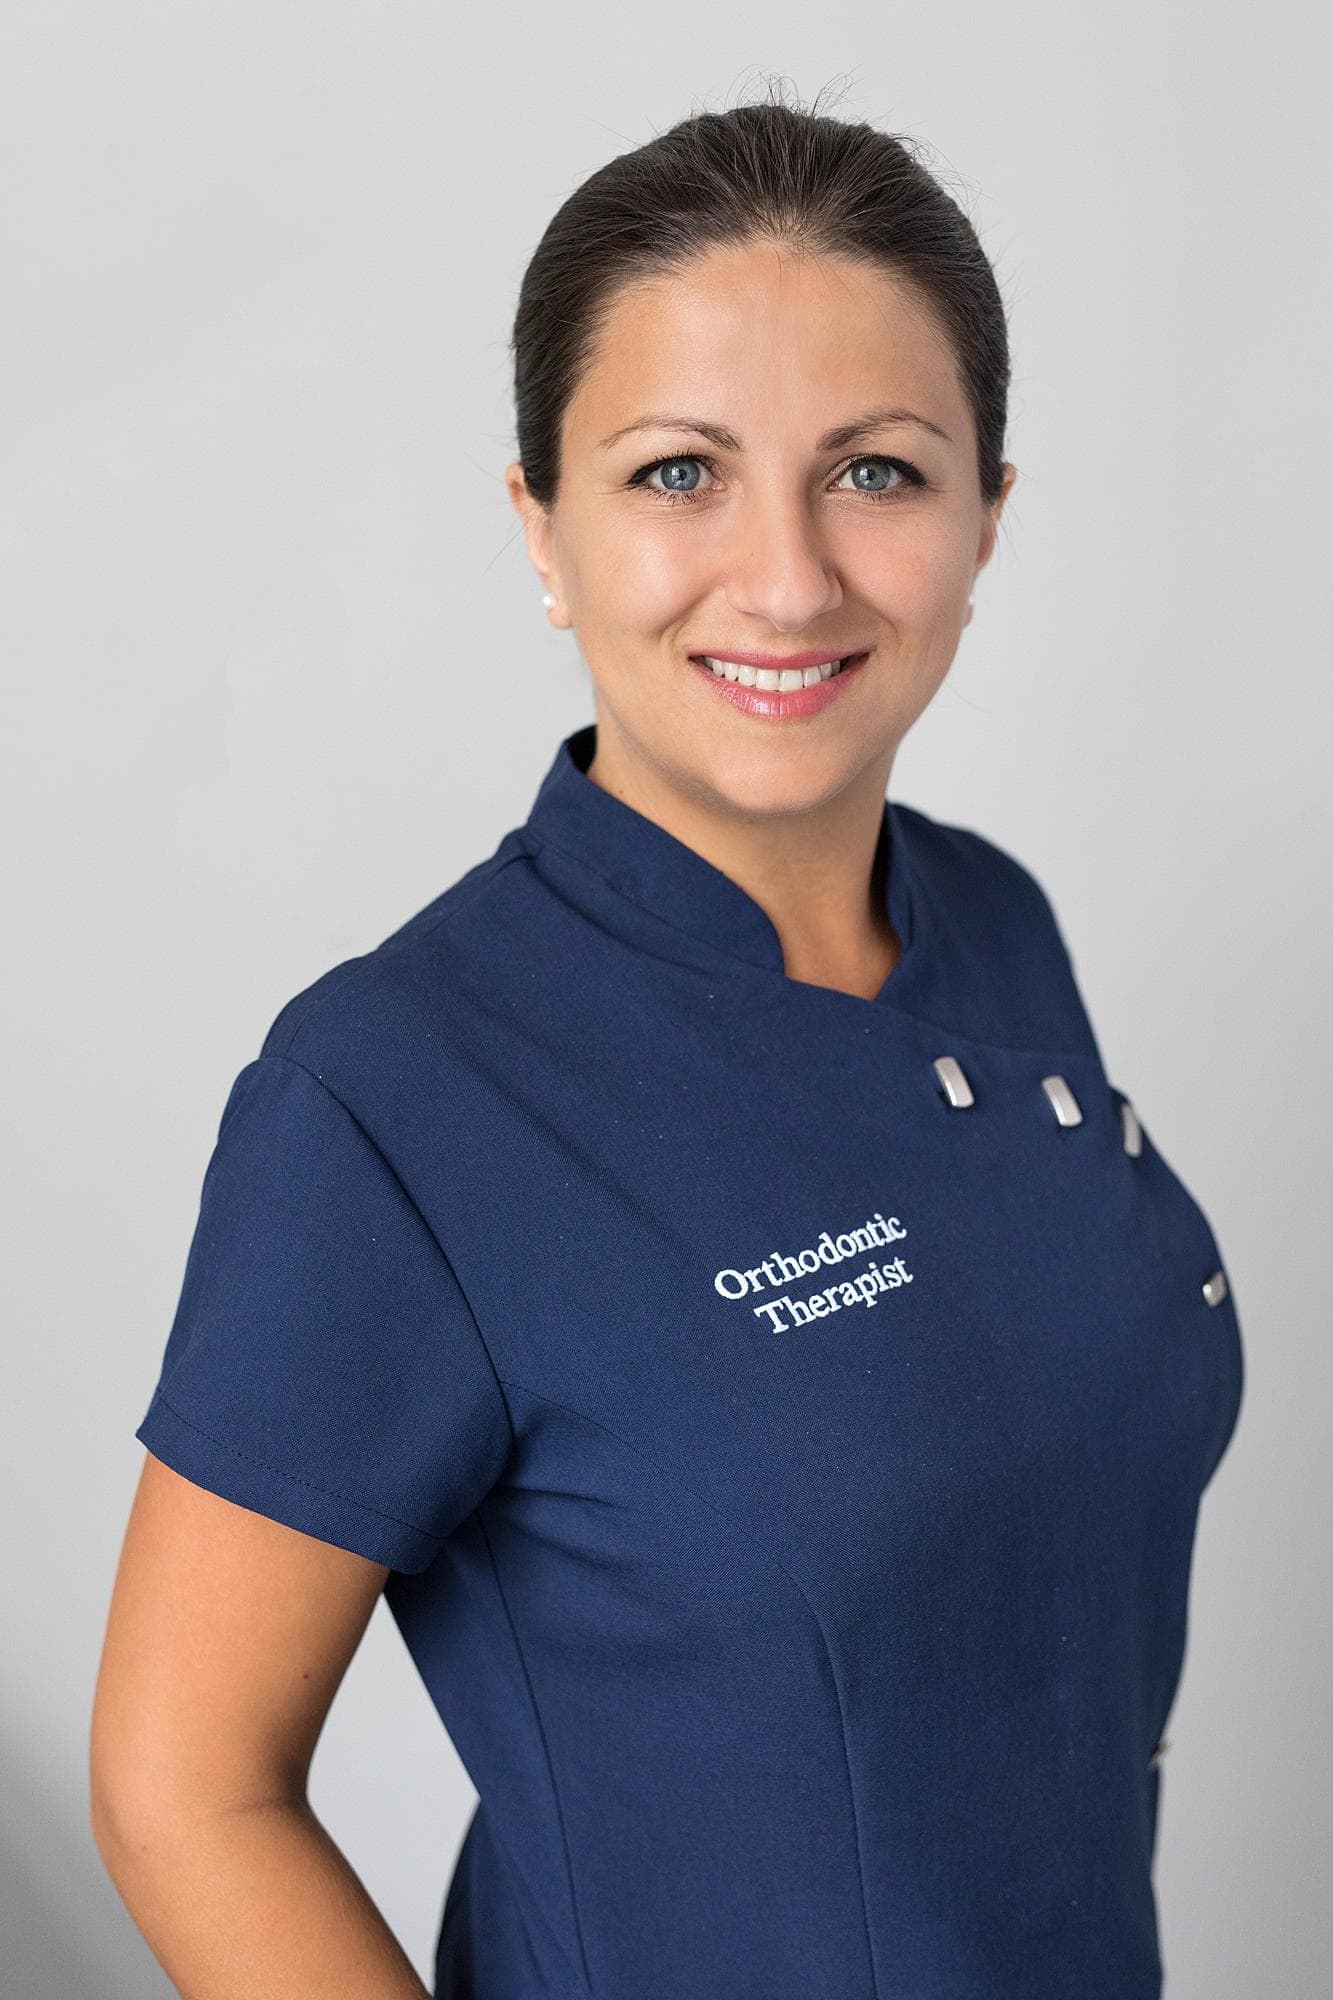 Orthodontic Therapist Personal Branding Portrait